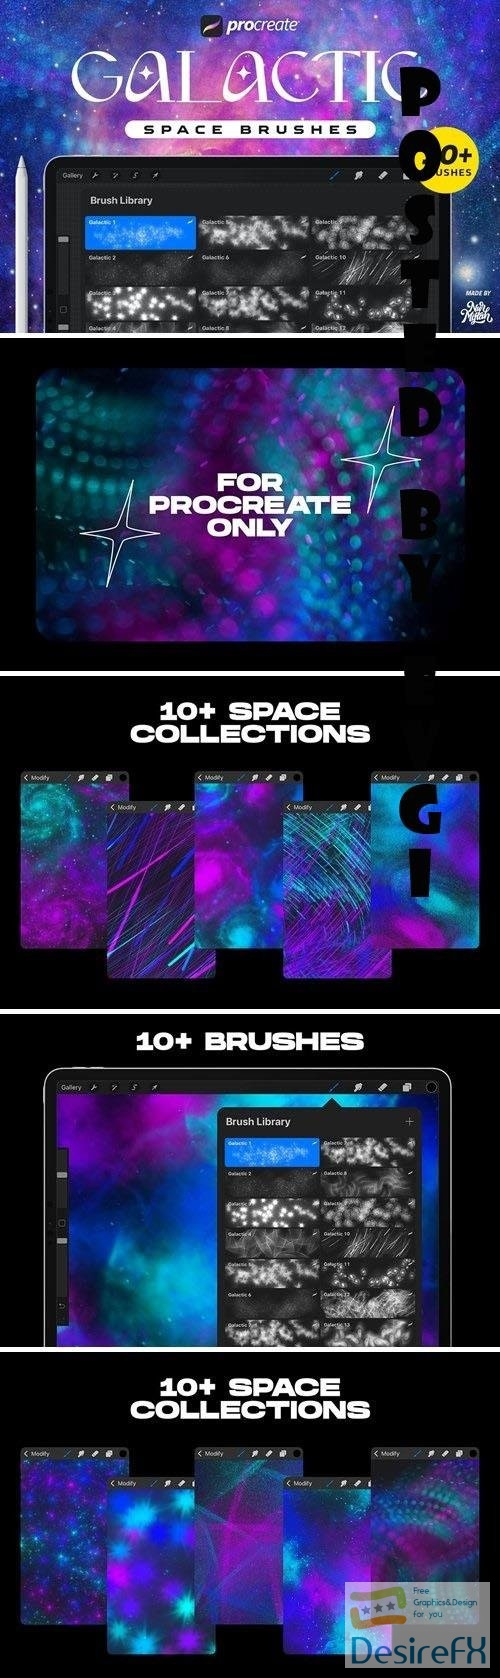 Procreate Galactic Space Brushes